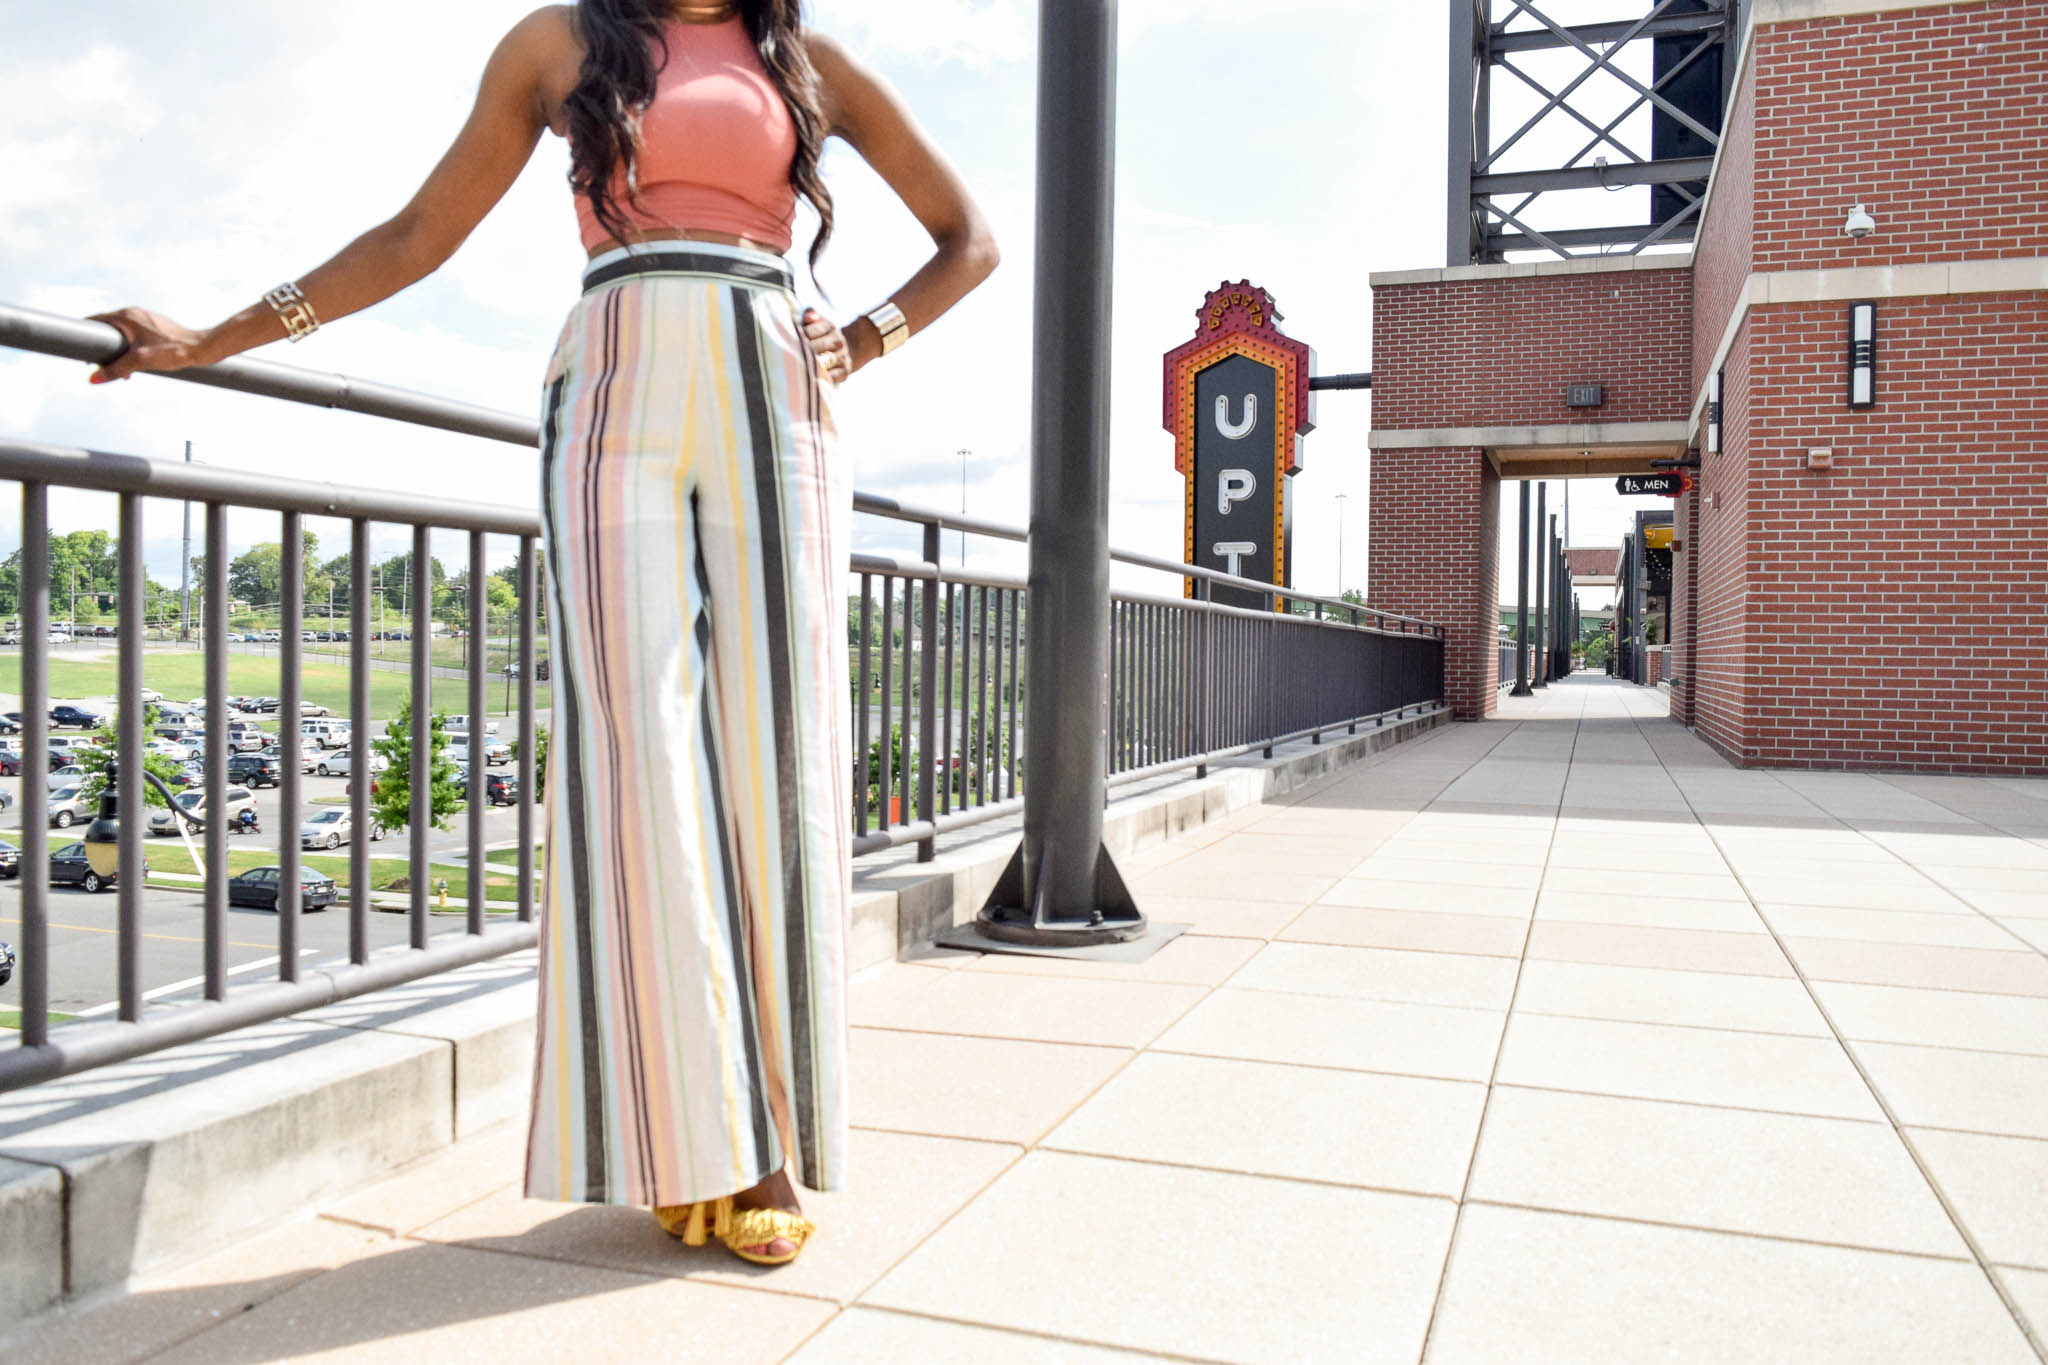 Style-files-target-Women Palazzo-Pant- Striped-  Xhilaration-Xhilaration-striped-wideleg-linen-pants-forever21-crop-racerback-tank-yellow-tayrey-fringe-heels-justfab-yellow-fringe-heels-how-oohlalablog-6